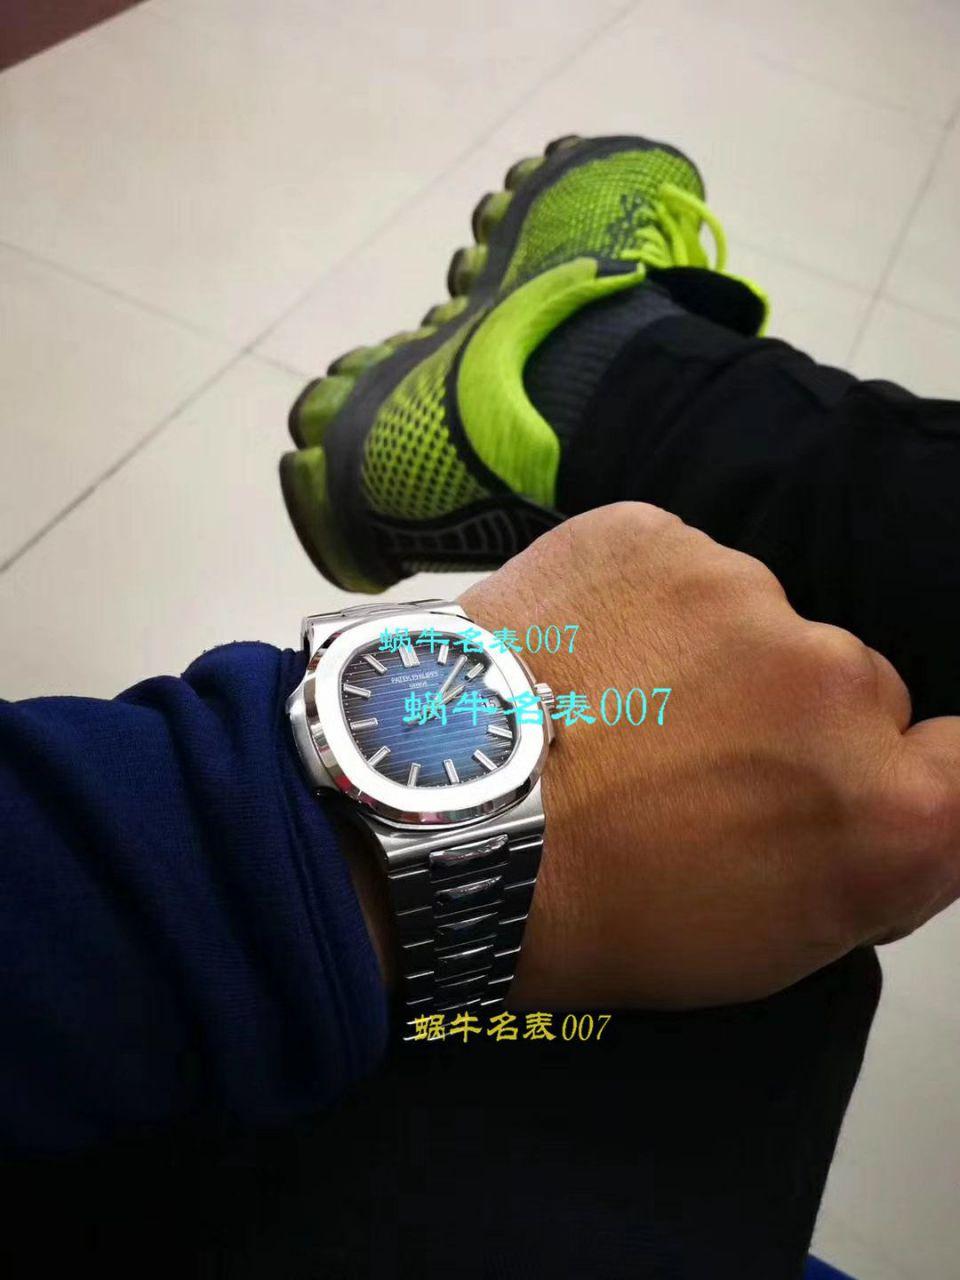 【PF一比一超A高精仿手表】百达翡丽Nautilus运动系列5711/1A-011腕表(鹦鹉螺)